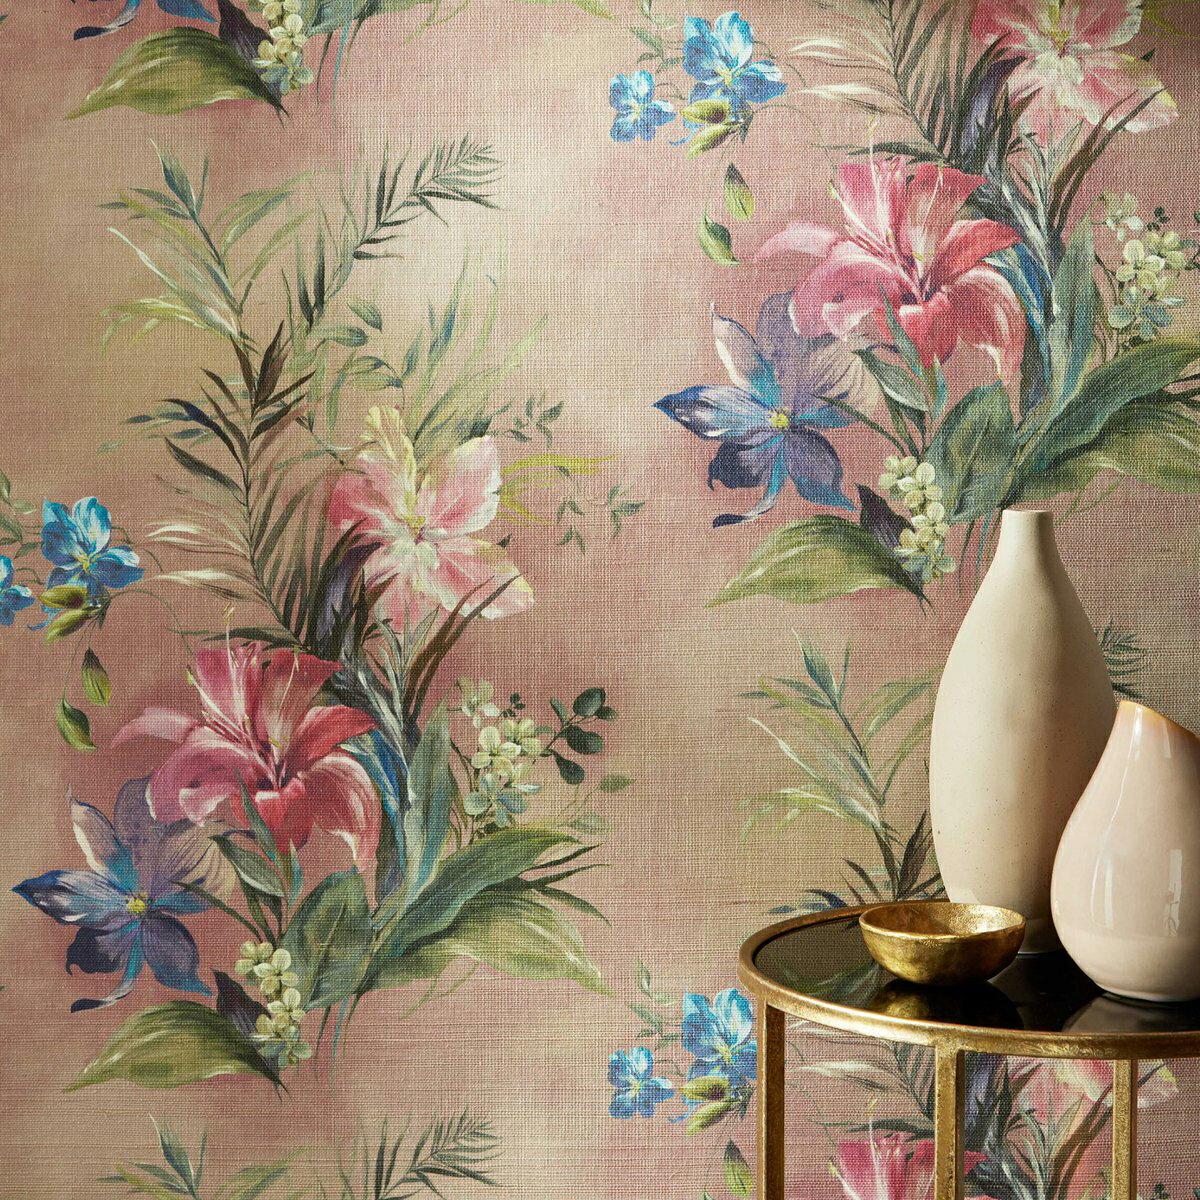 E1D1-15401 (1色) 英國期貨壁紙 特殊自然草編纖維 古典優雅 浪漫花朵植物